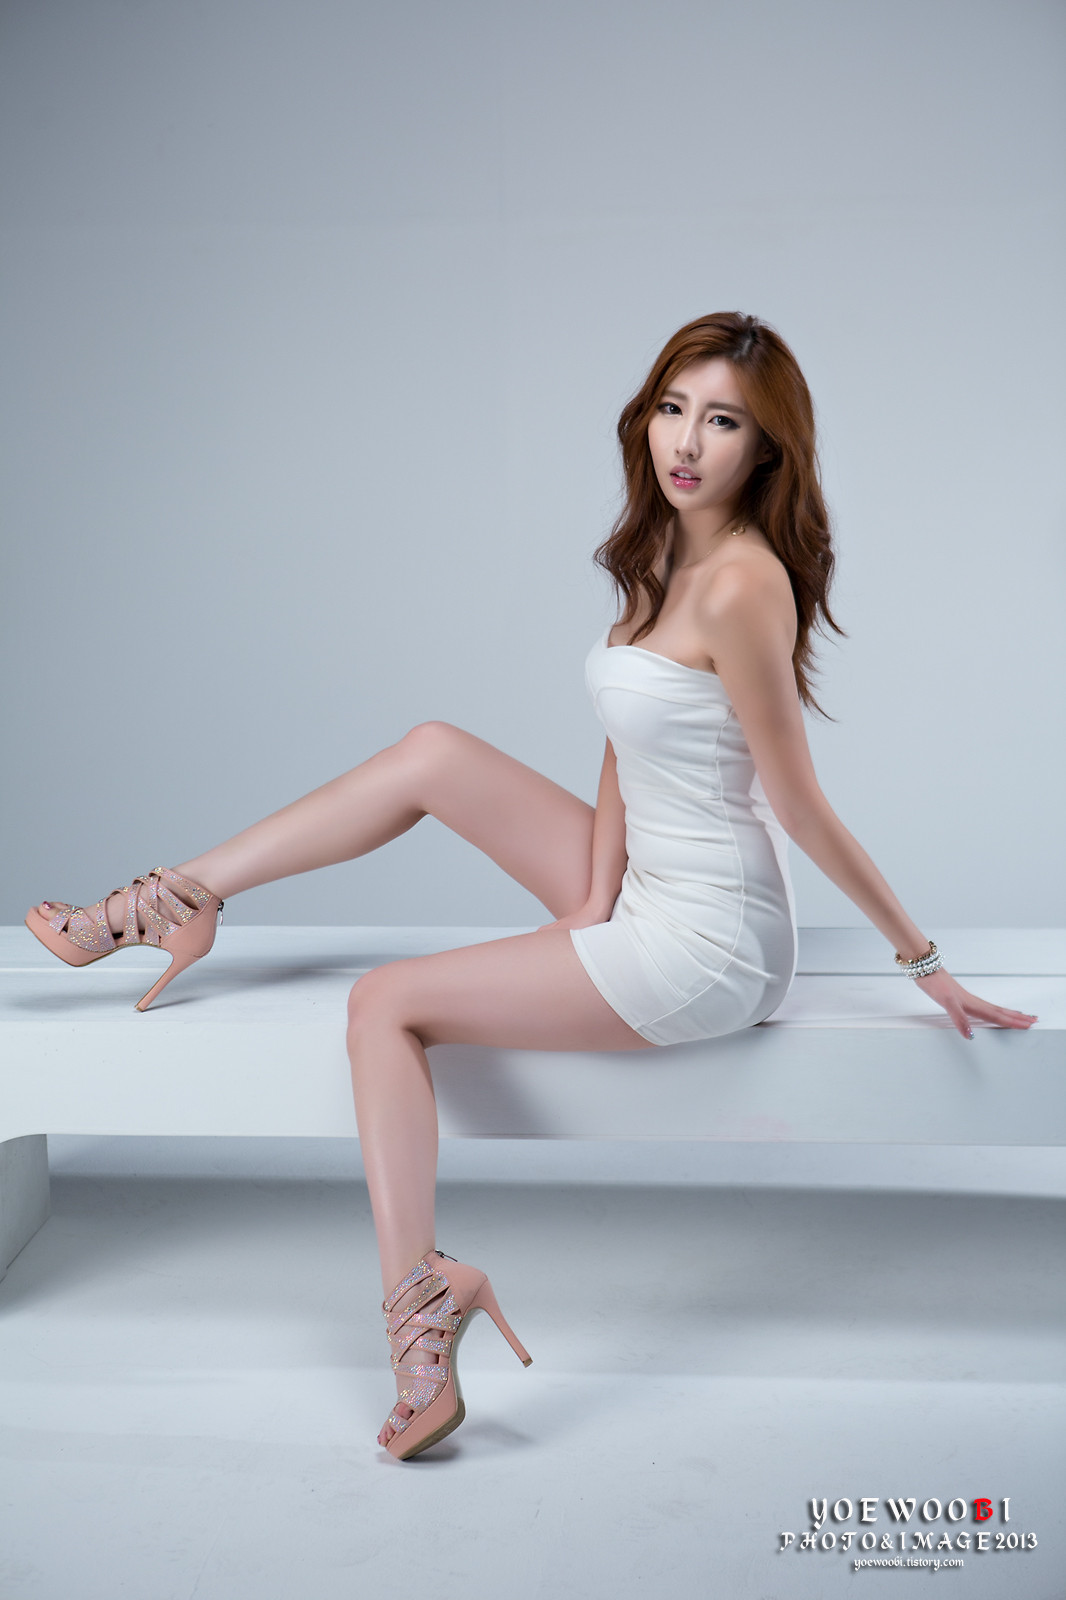 Myron recommends Yang ye won nude